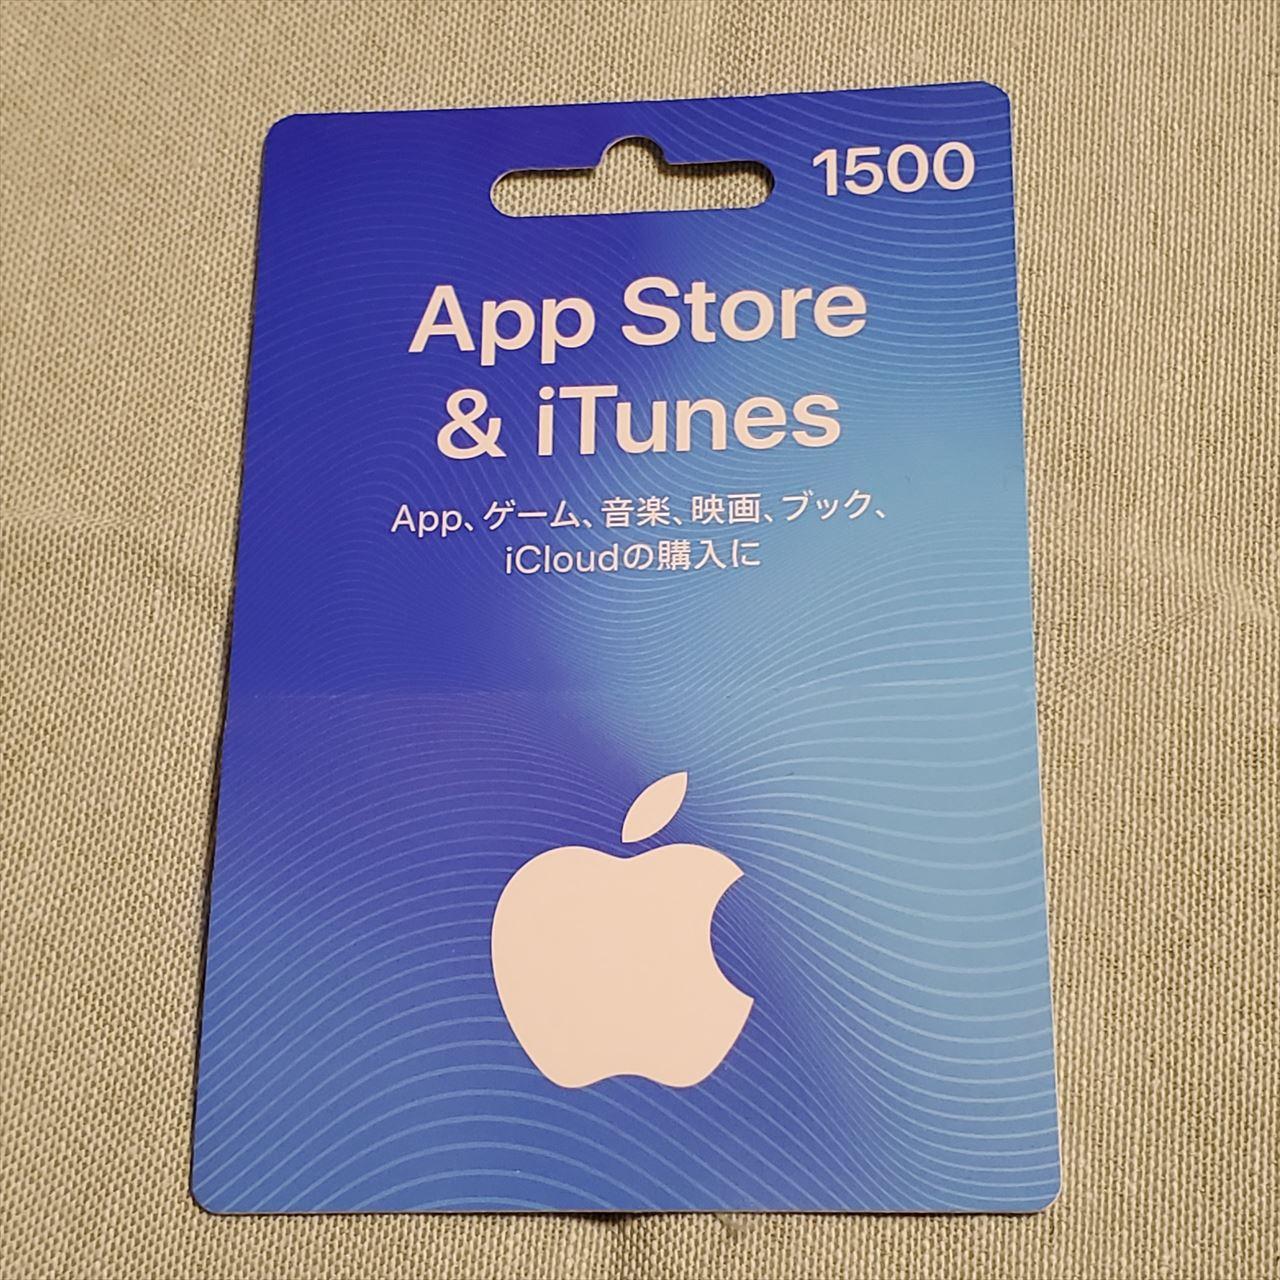 App Store & iTunesギフトカードの外観